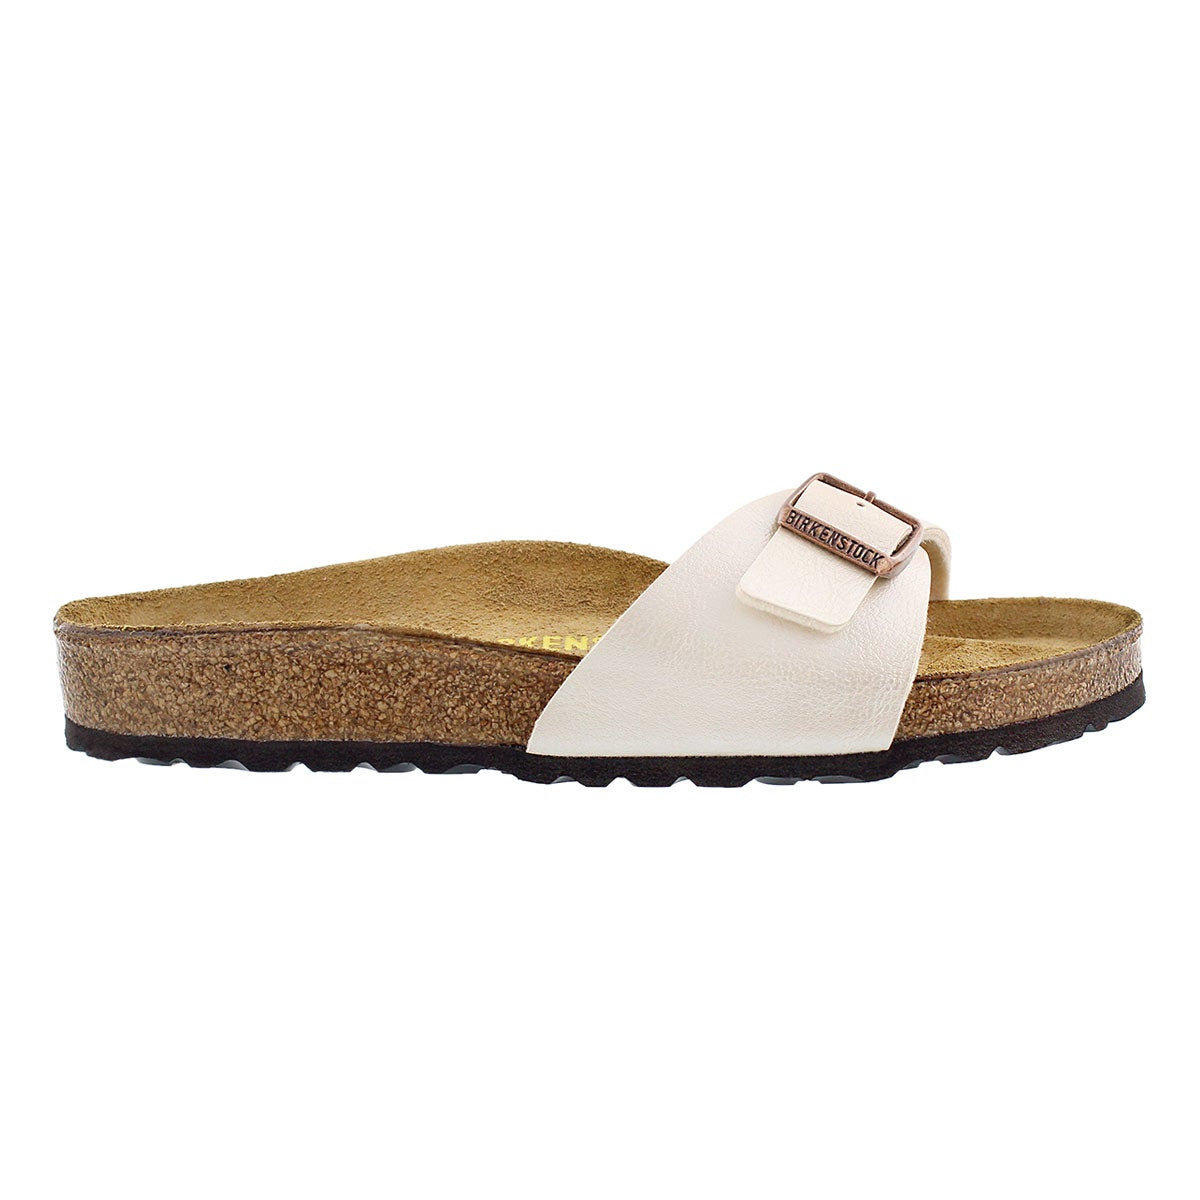 Lds Madrid BF pearl white 1 strap sandal